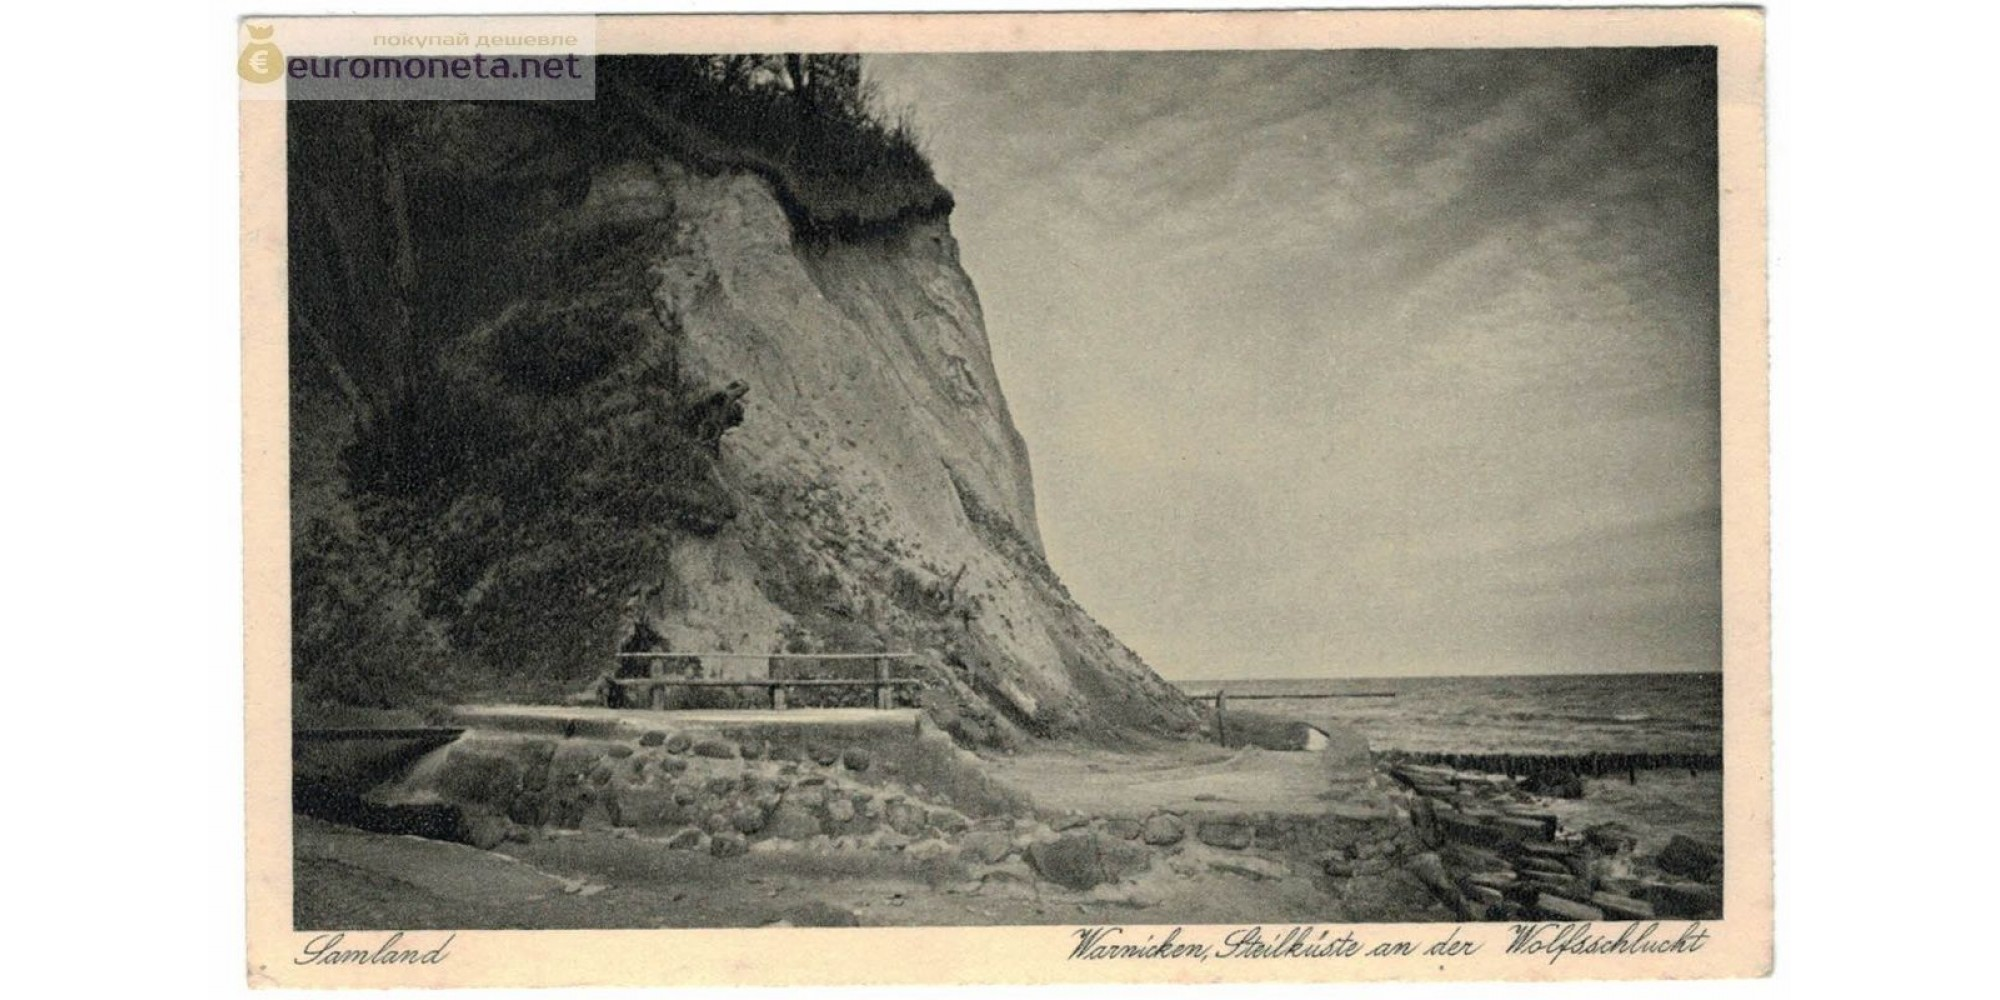 Открытка Пруссия Лесное Варникен Warnicken Wolfsschlucht Балтийское море пляж